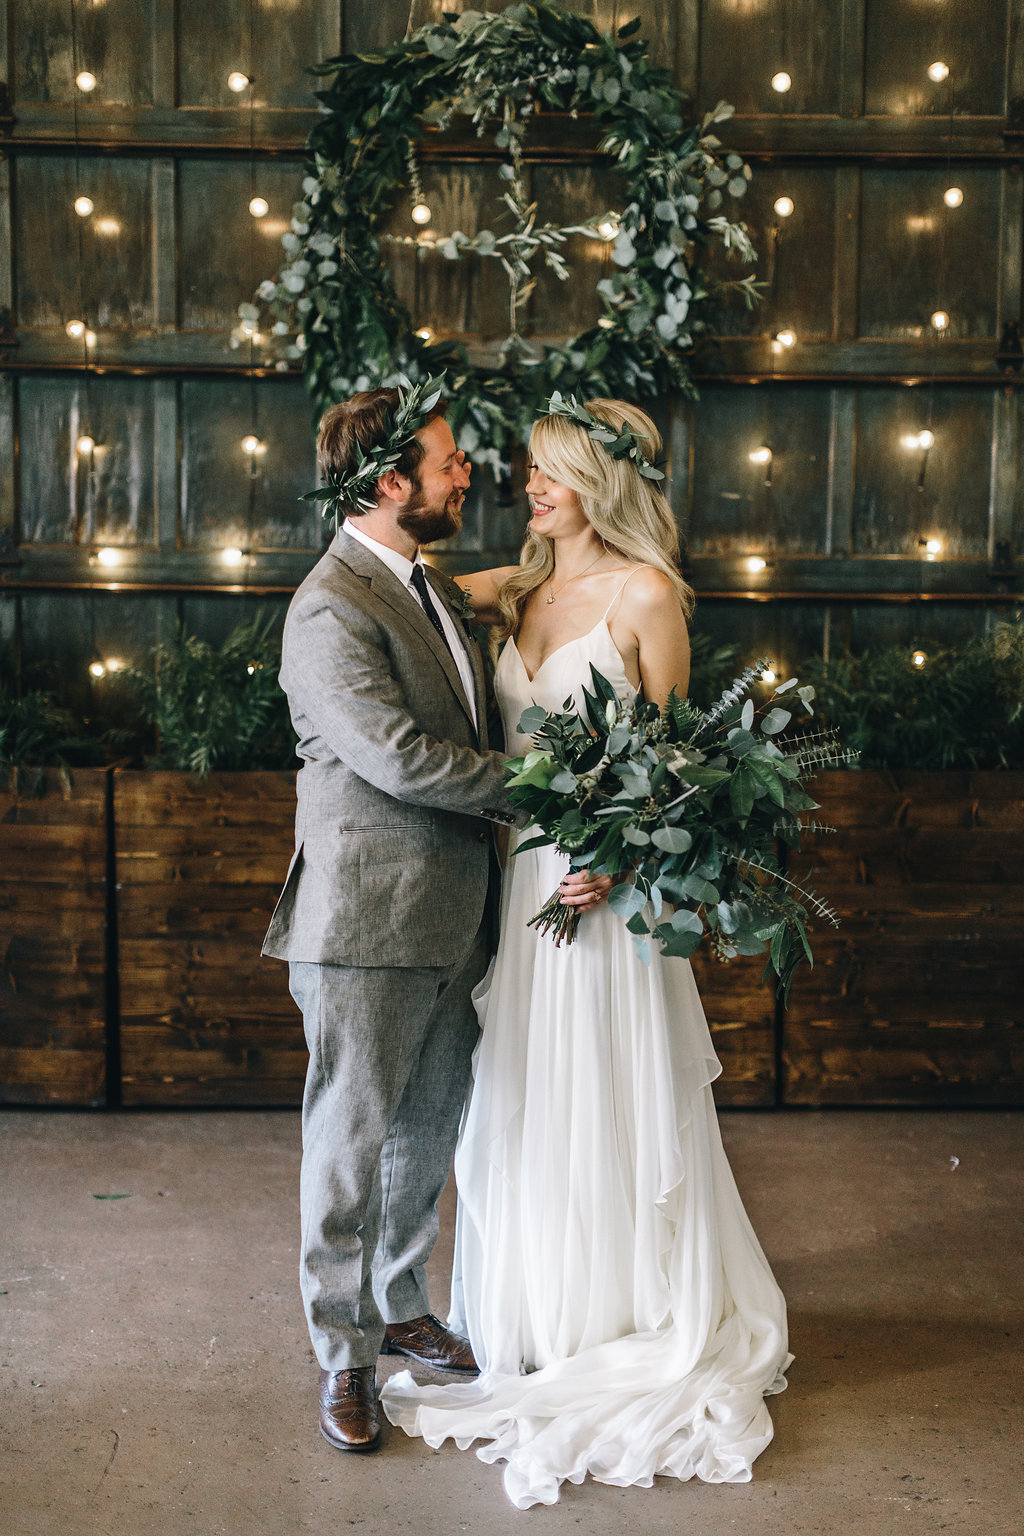 shannon-britt-mackensey-alexander-photography-green-wedding-shoes-ivory-and-beau-bridal-boutique-savannah-wedding-planner-savannah-bridal-boutique-savannah-wedding-dresses-savannah-florist-summer-solstice-wedding-boho-soho-south-cafe-wedding-23.jpg